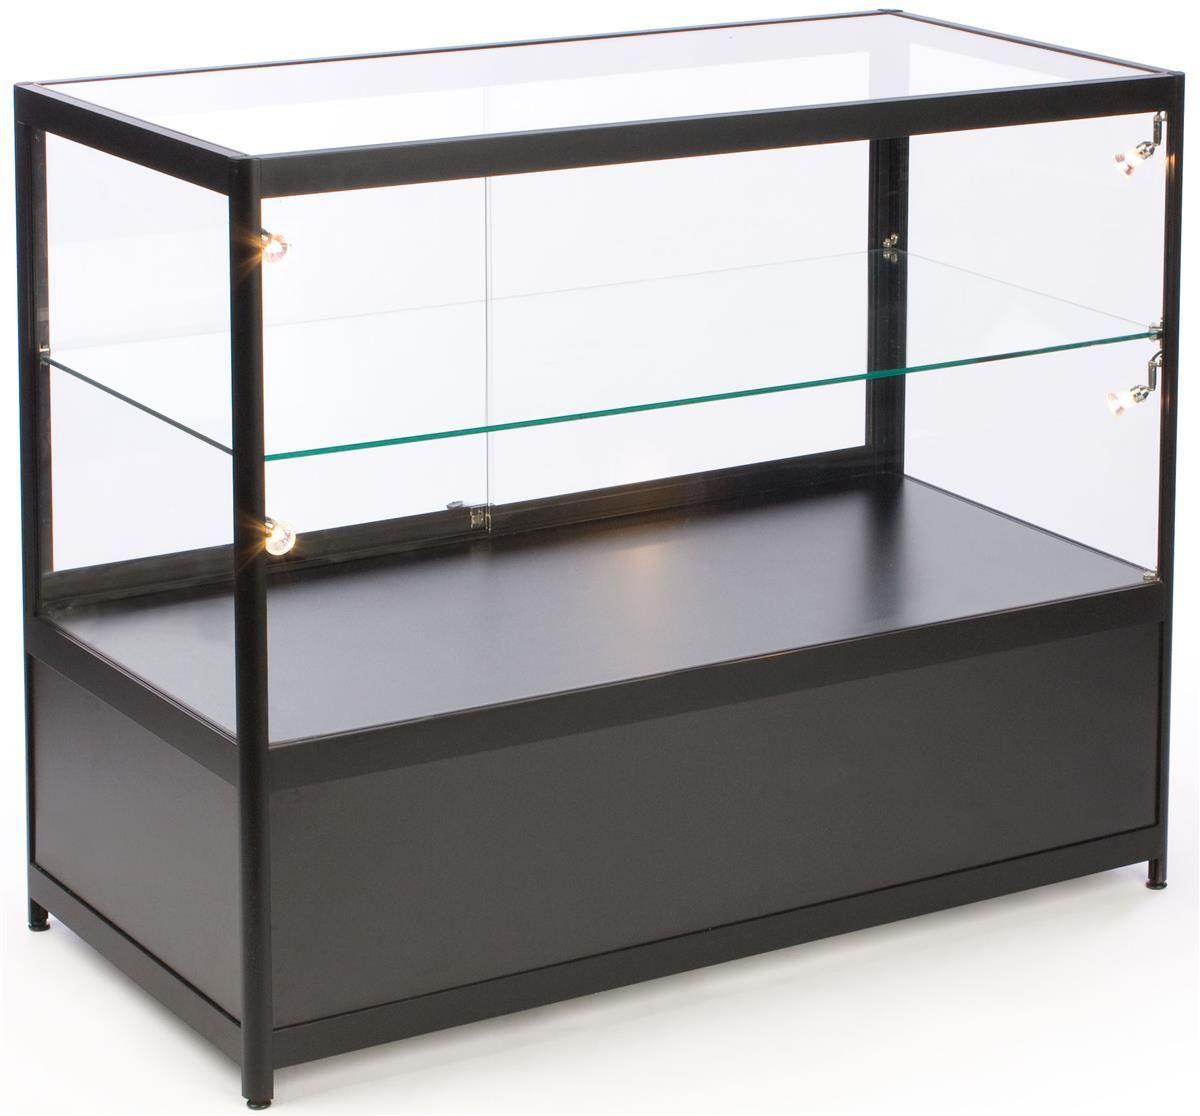 48 Retail Display Case W Cabinet Side Lights Slider Door Ships Assembled Black Retail Display Cases Glass Cabinets Display Display Case